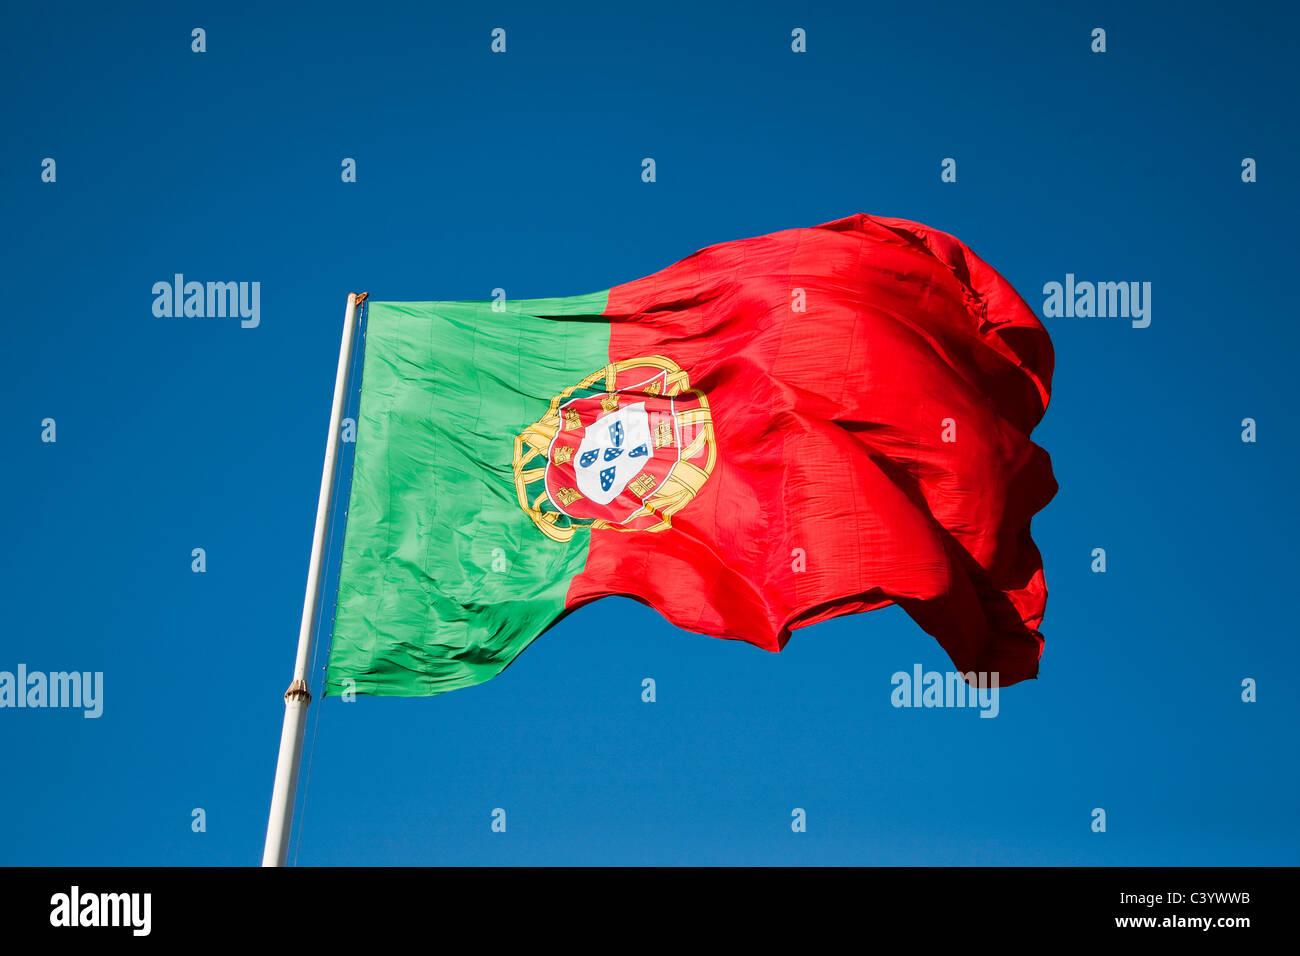 Portugal, Europa, Flagge, Fahne, Flagge, grün, rot Stockbild